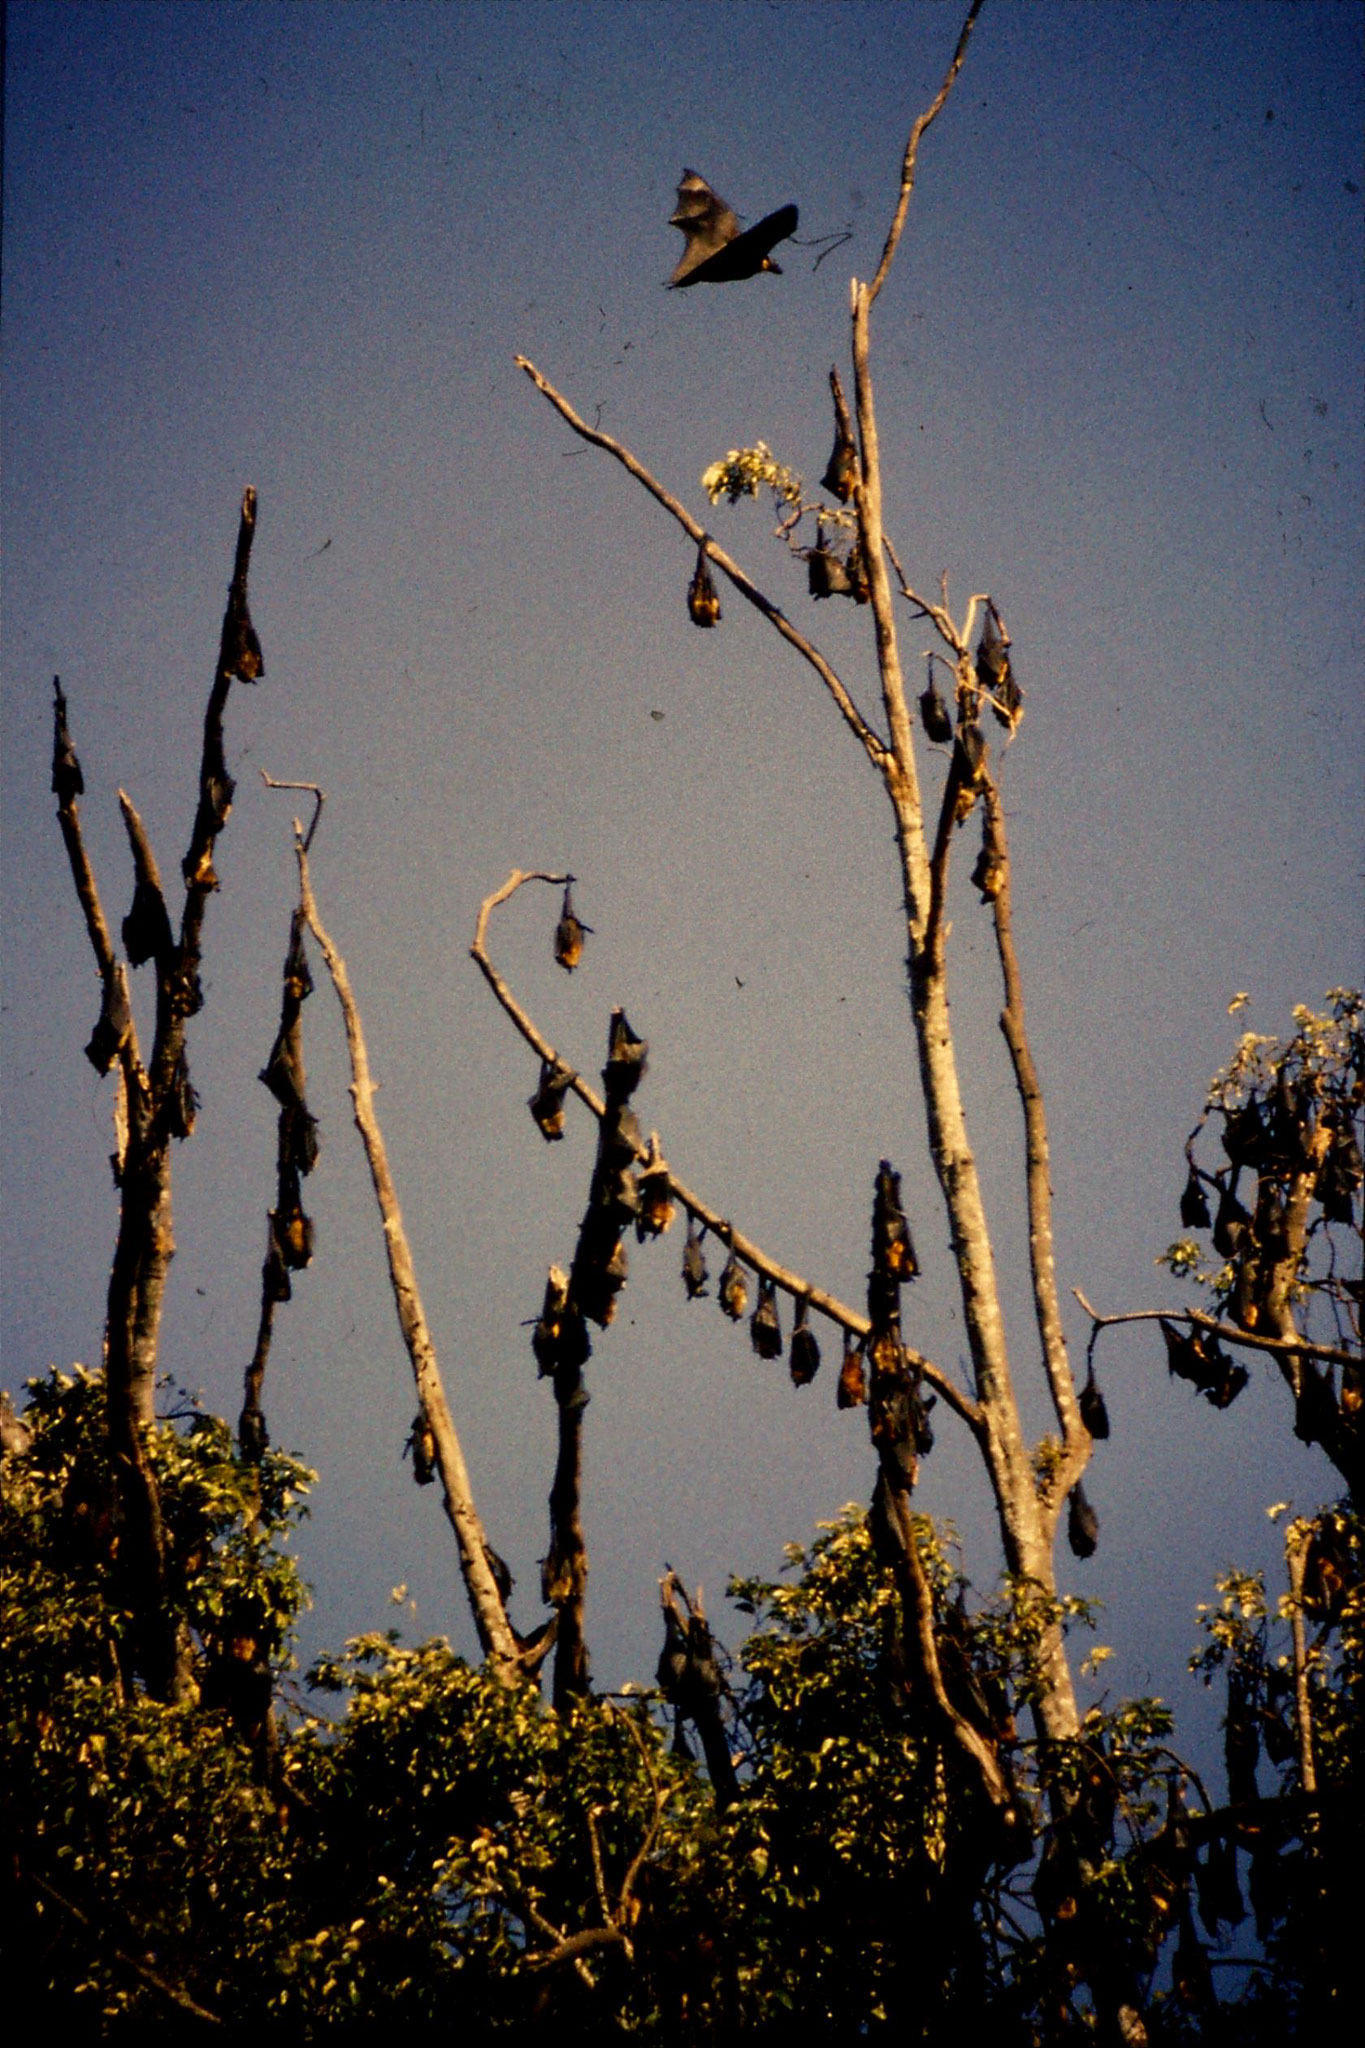 5/2/1990: 32: Kandy Botanic Gardens